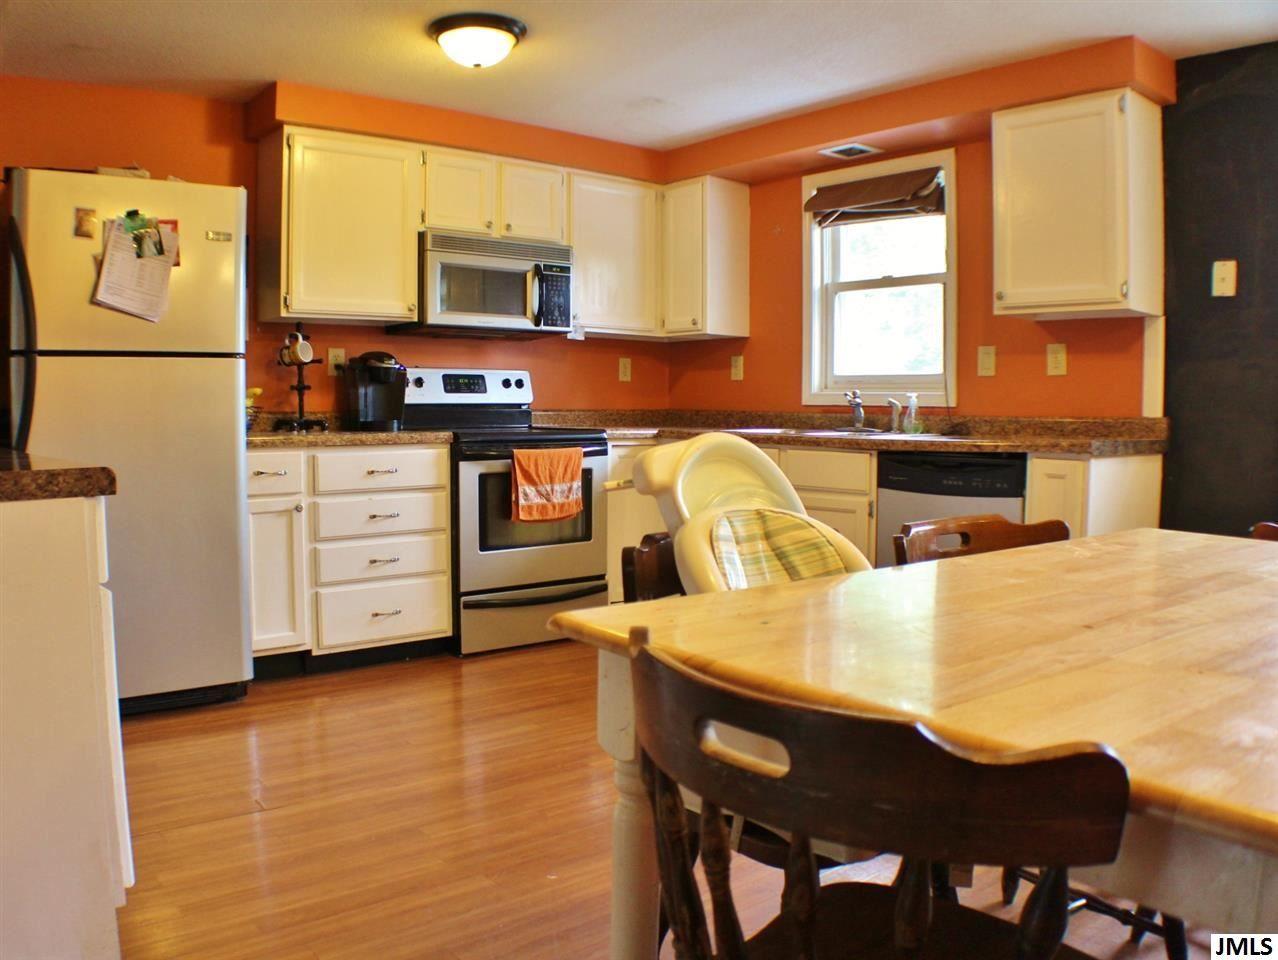 Jackson Michigan Real Estate Orange Kitchen Walls Kitchen Design Stylish Kitchen